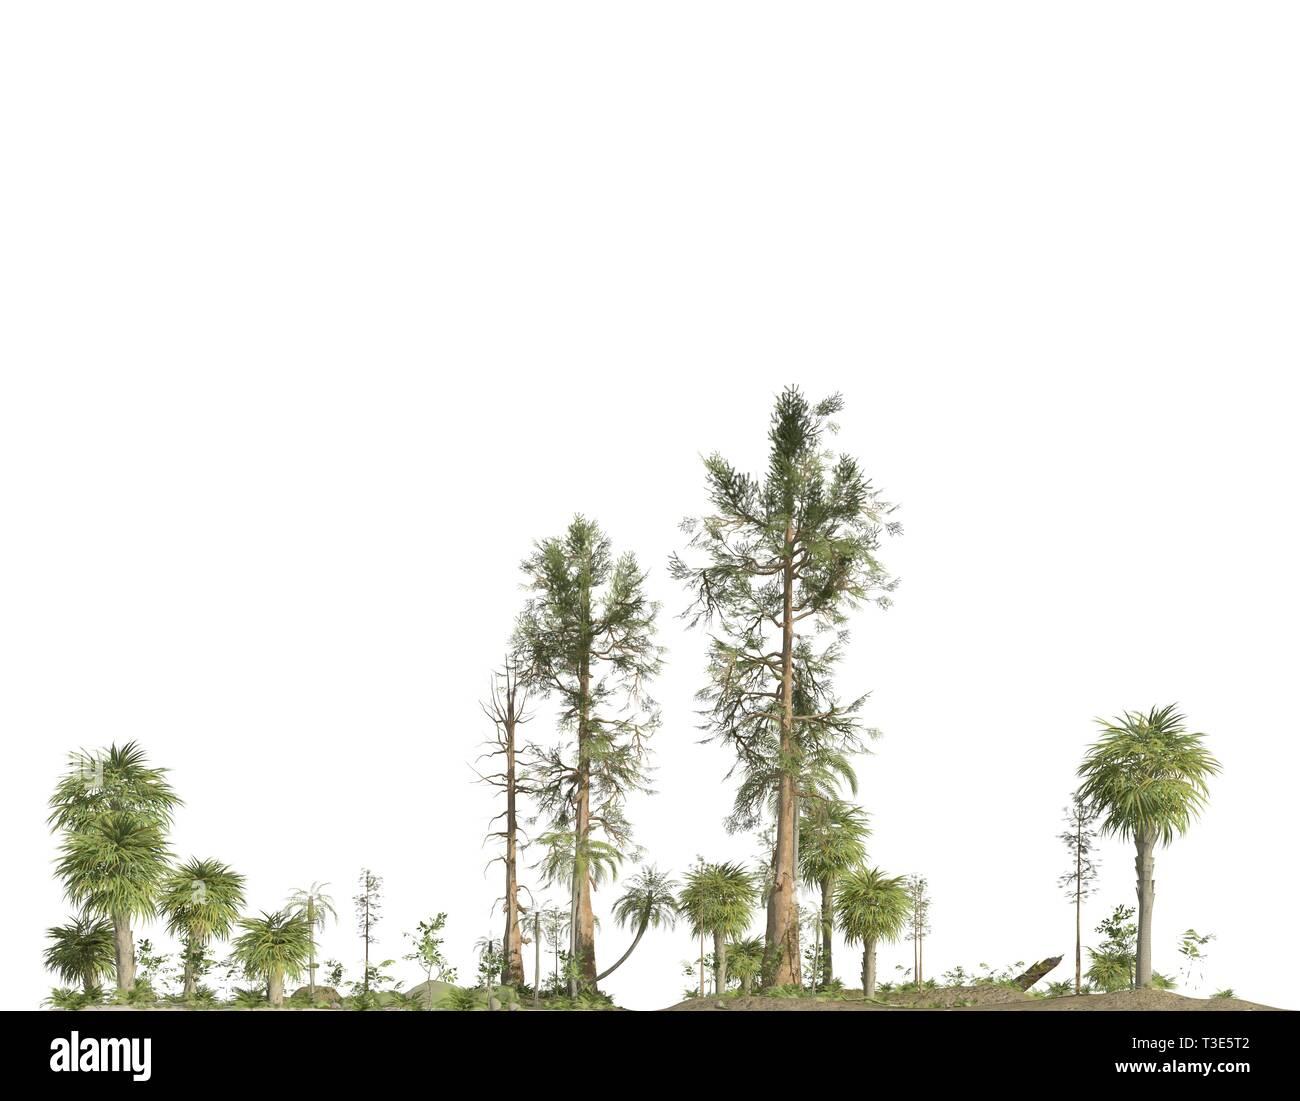 Forest of the mesozoic era isolated on white background 3D illustration - Stock Image